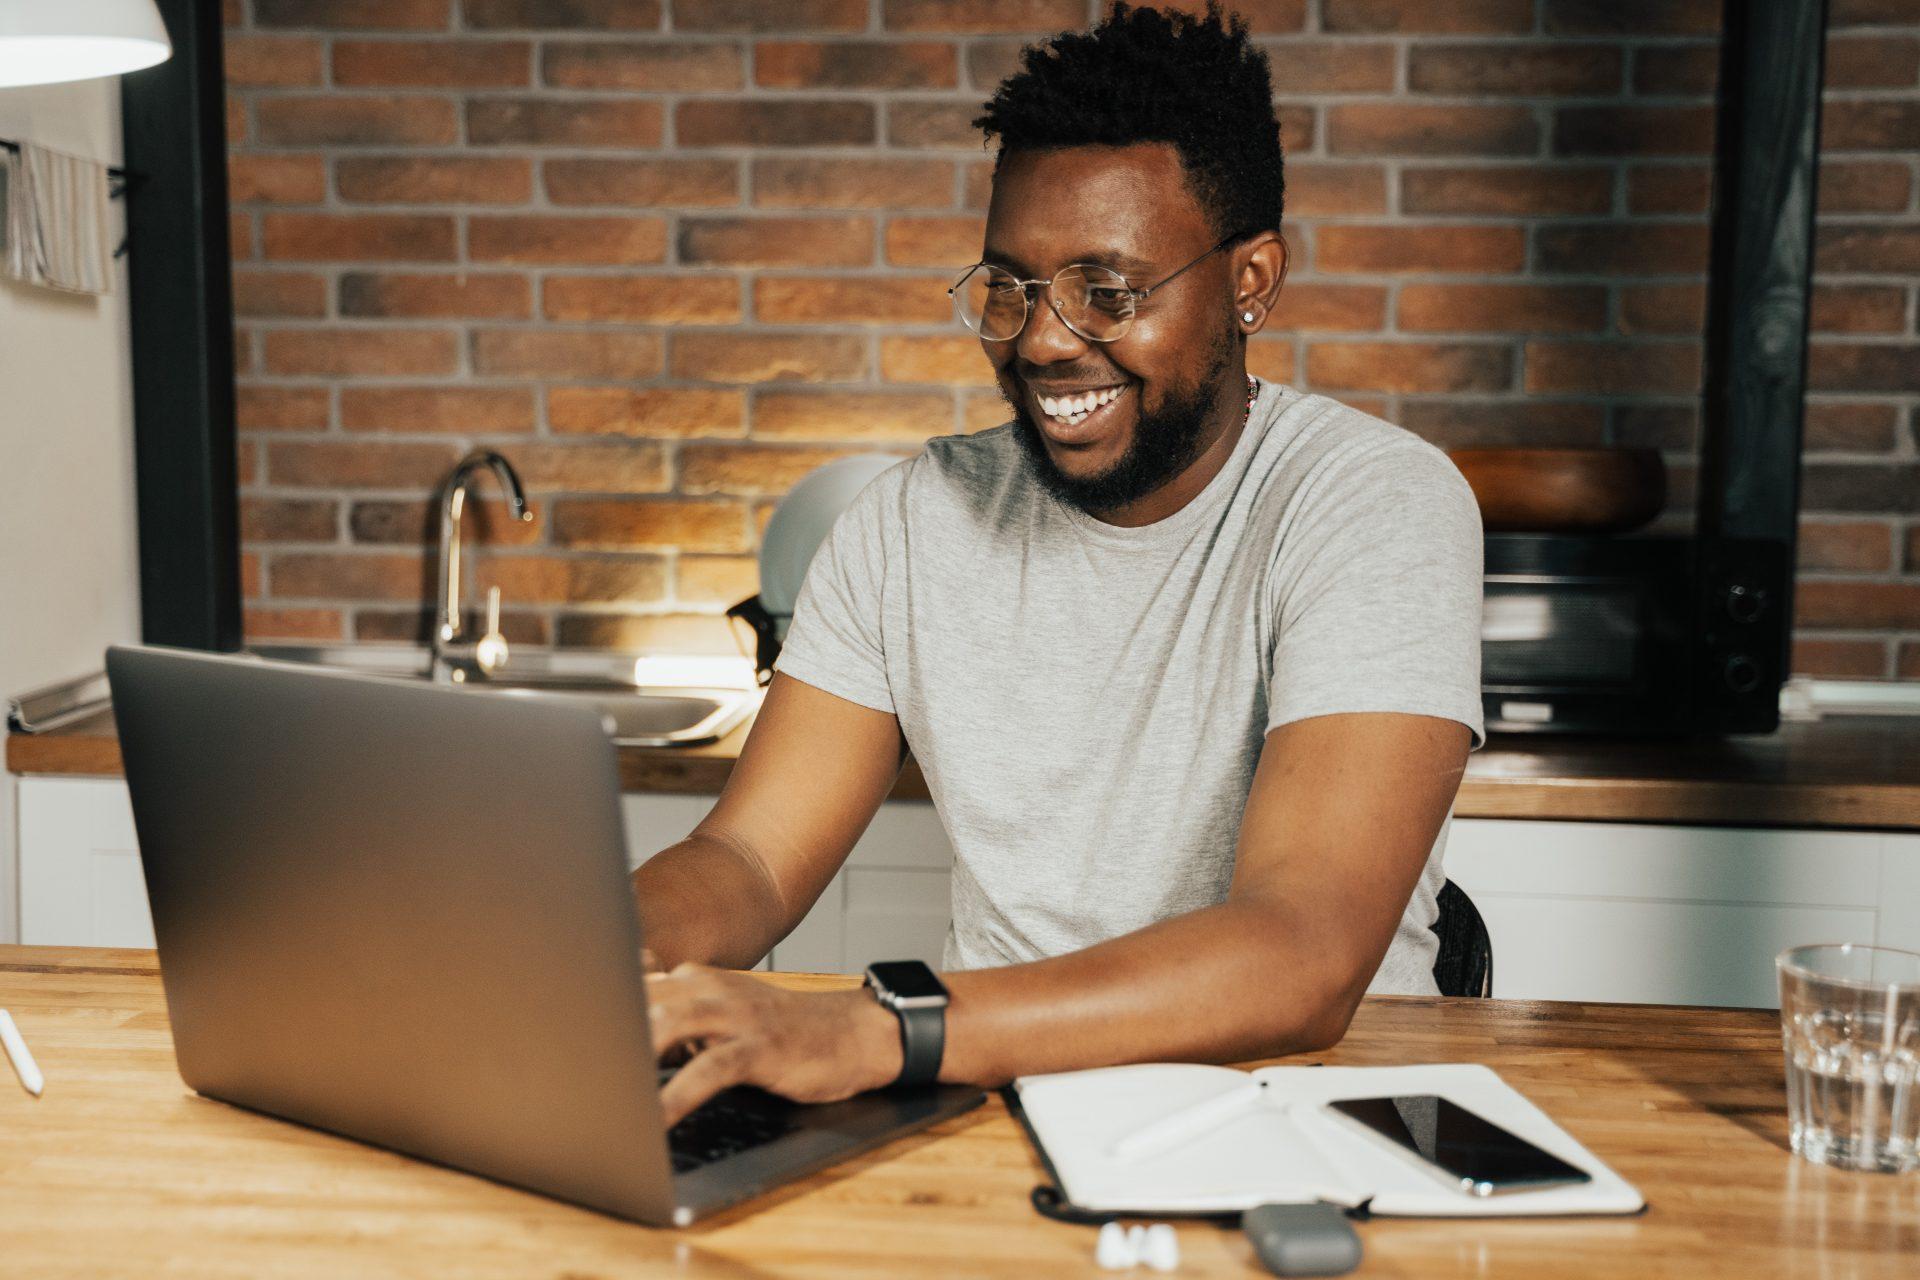 Digital marketing academy offering scholarships for spring semester